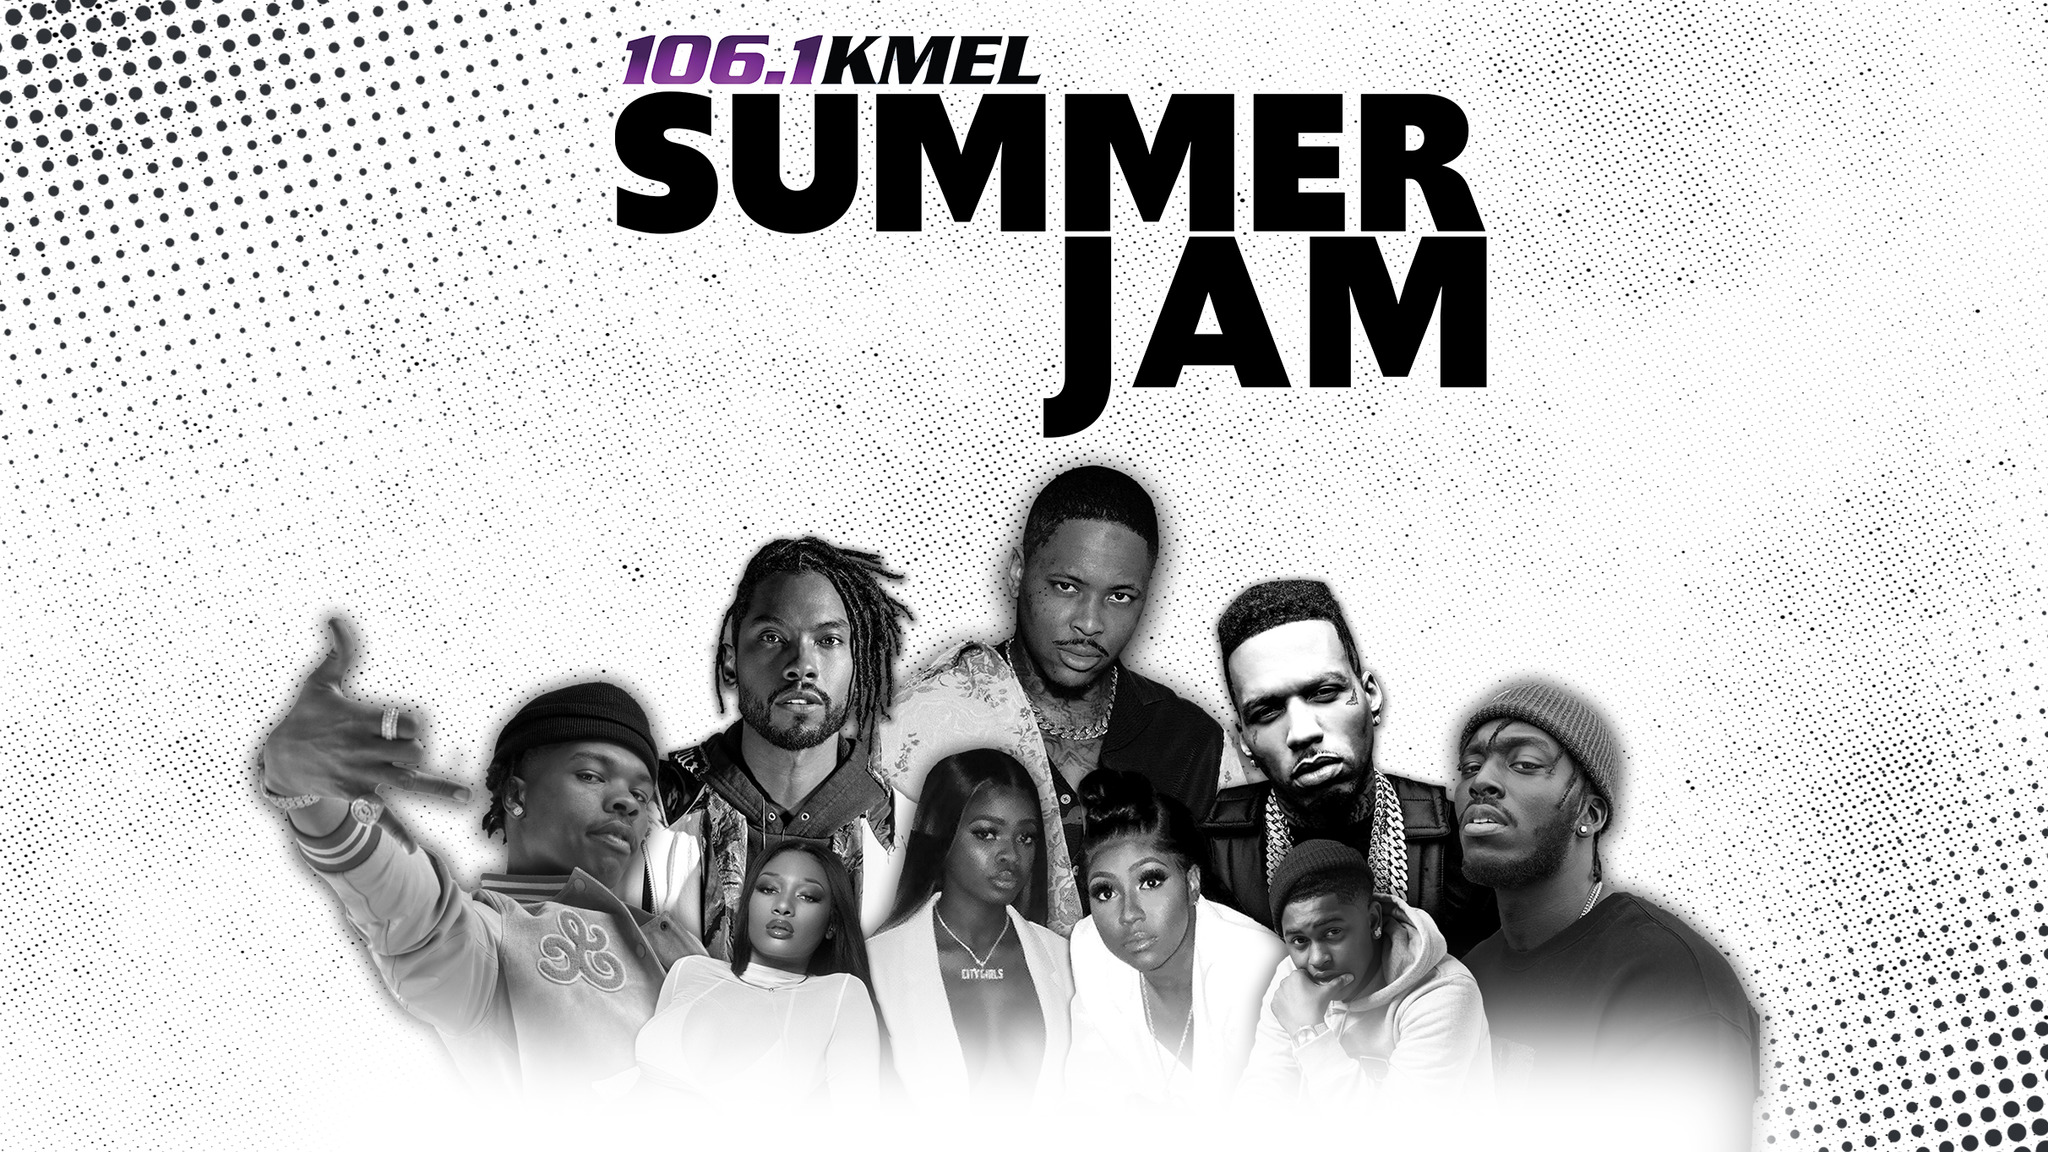 1061 KMEL Summer Jam 2019 at Oracle Arena Oakland Coliseum in 2048x1152